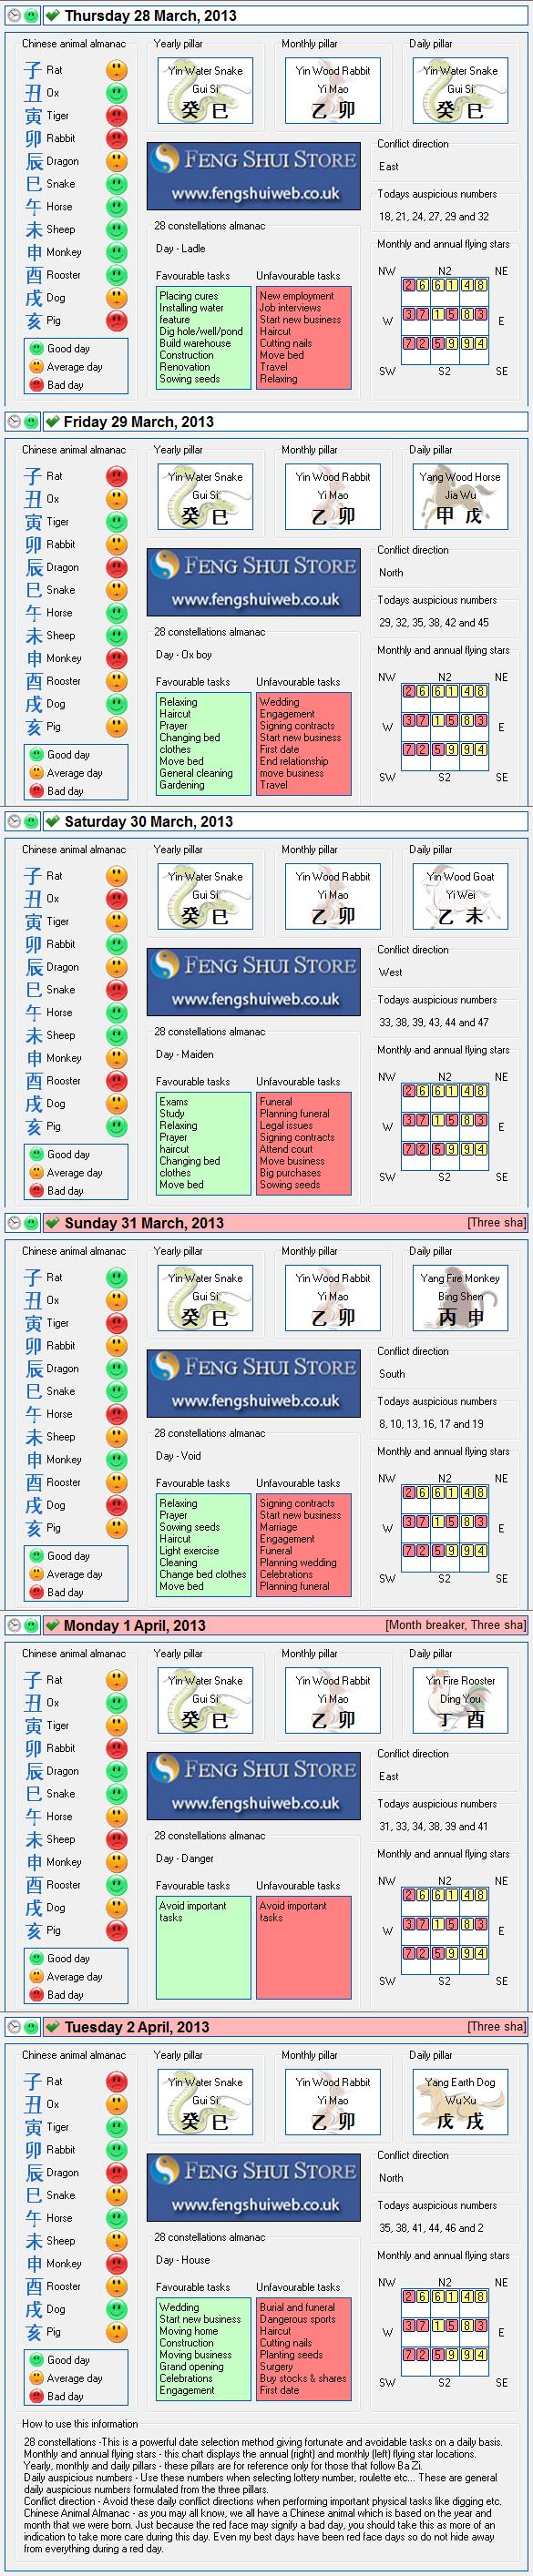 Tong Shu Almanac for Thursday 28th March - Tuesday 2nd April 2013